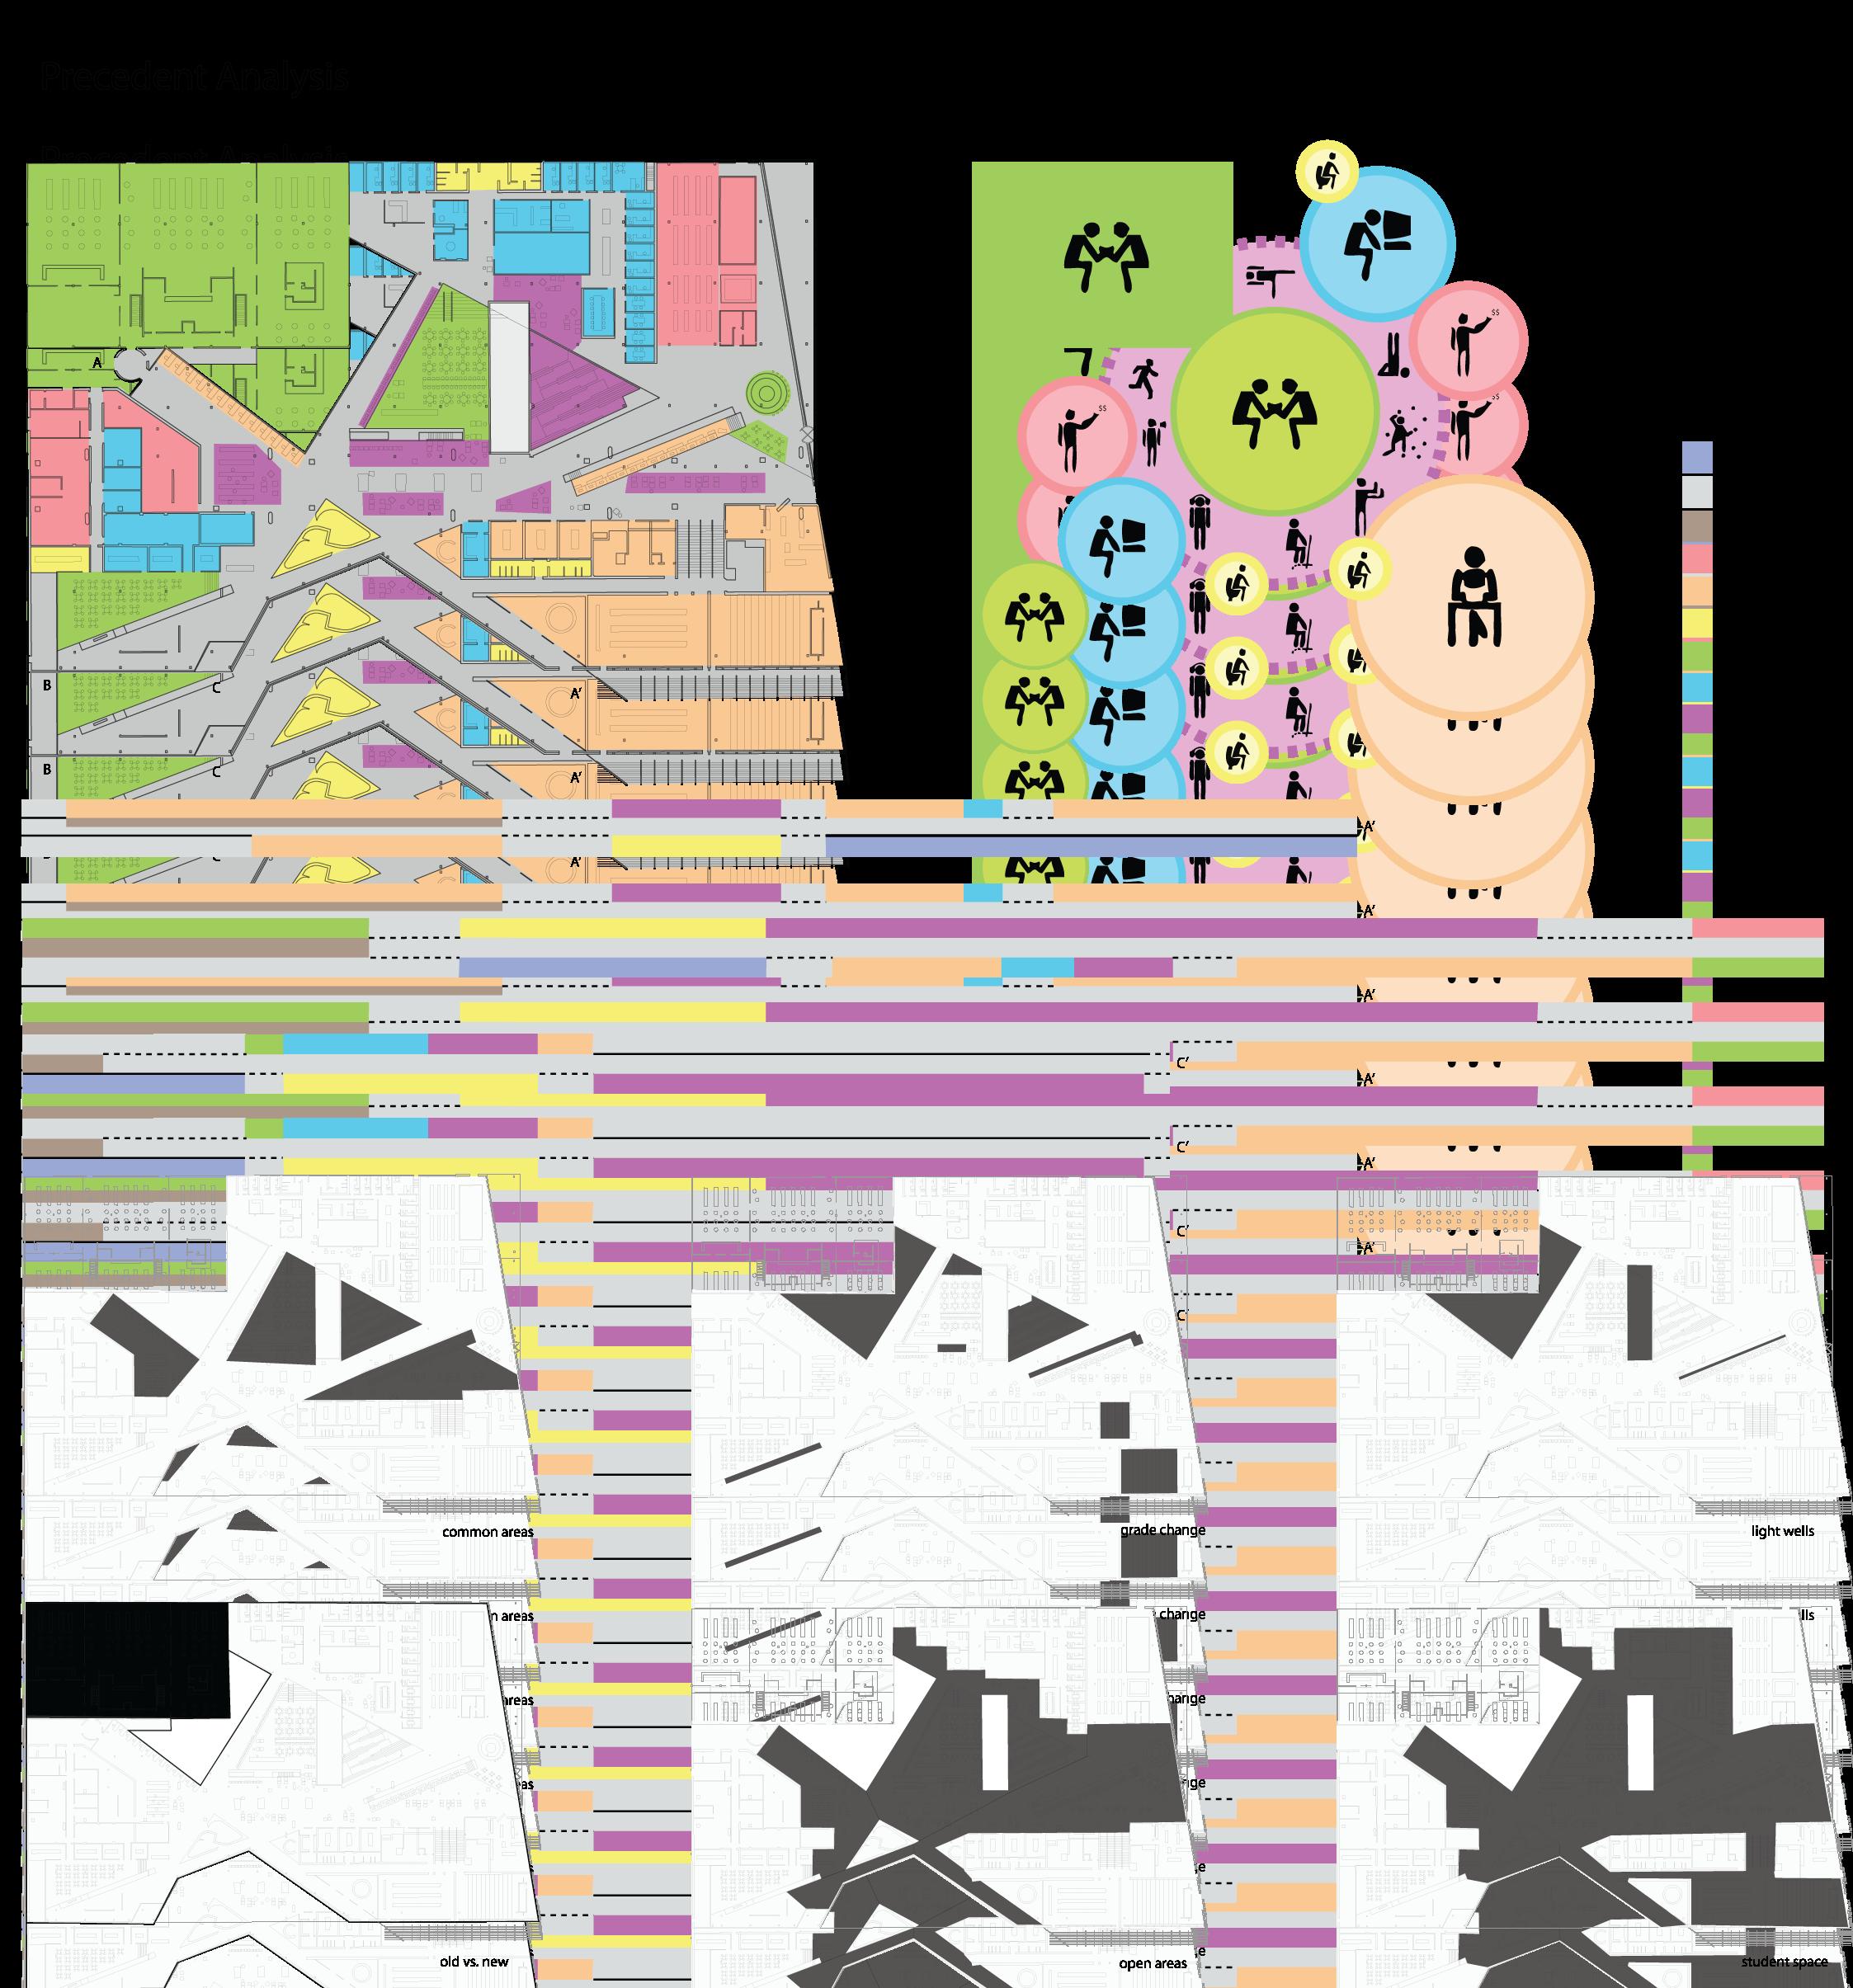 Iit oma precedent analysis diplomastudio pinterest diagram iit oma precedent analysis pooptronica Choice Image